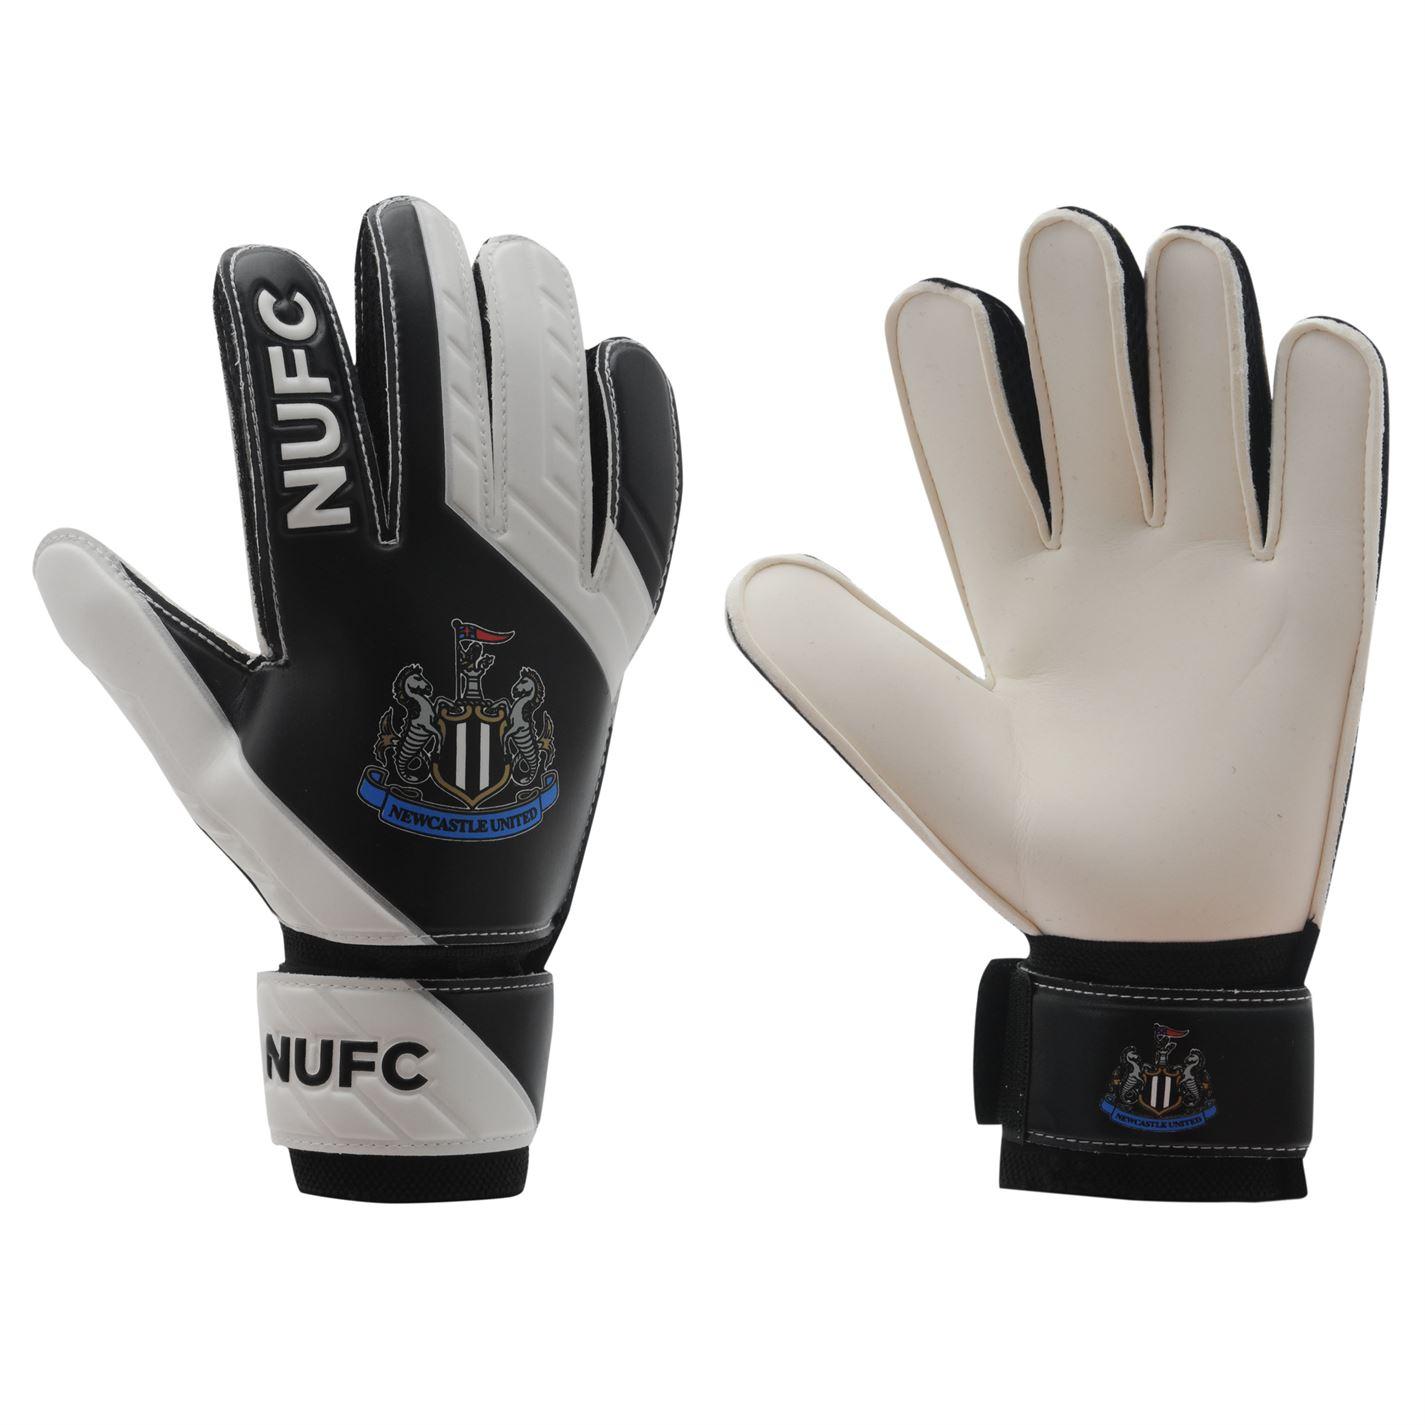 Team Goal Keeper Gloves